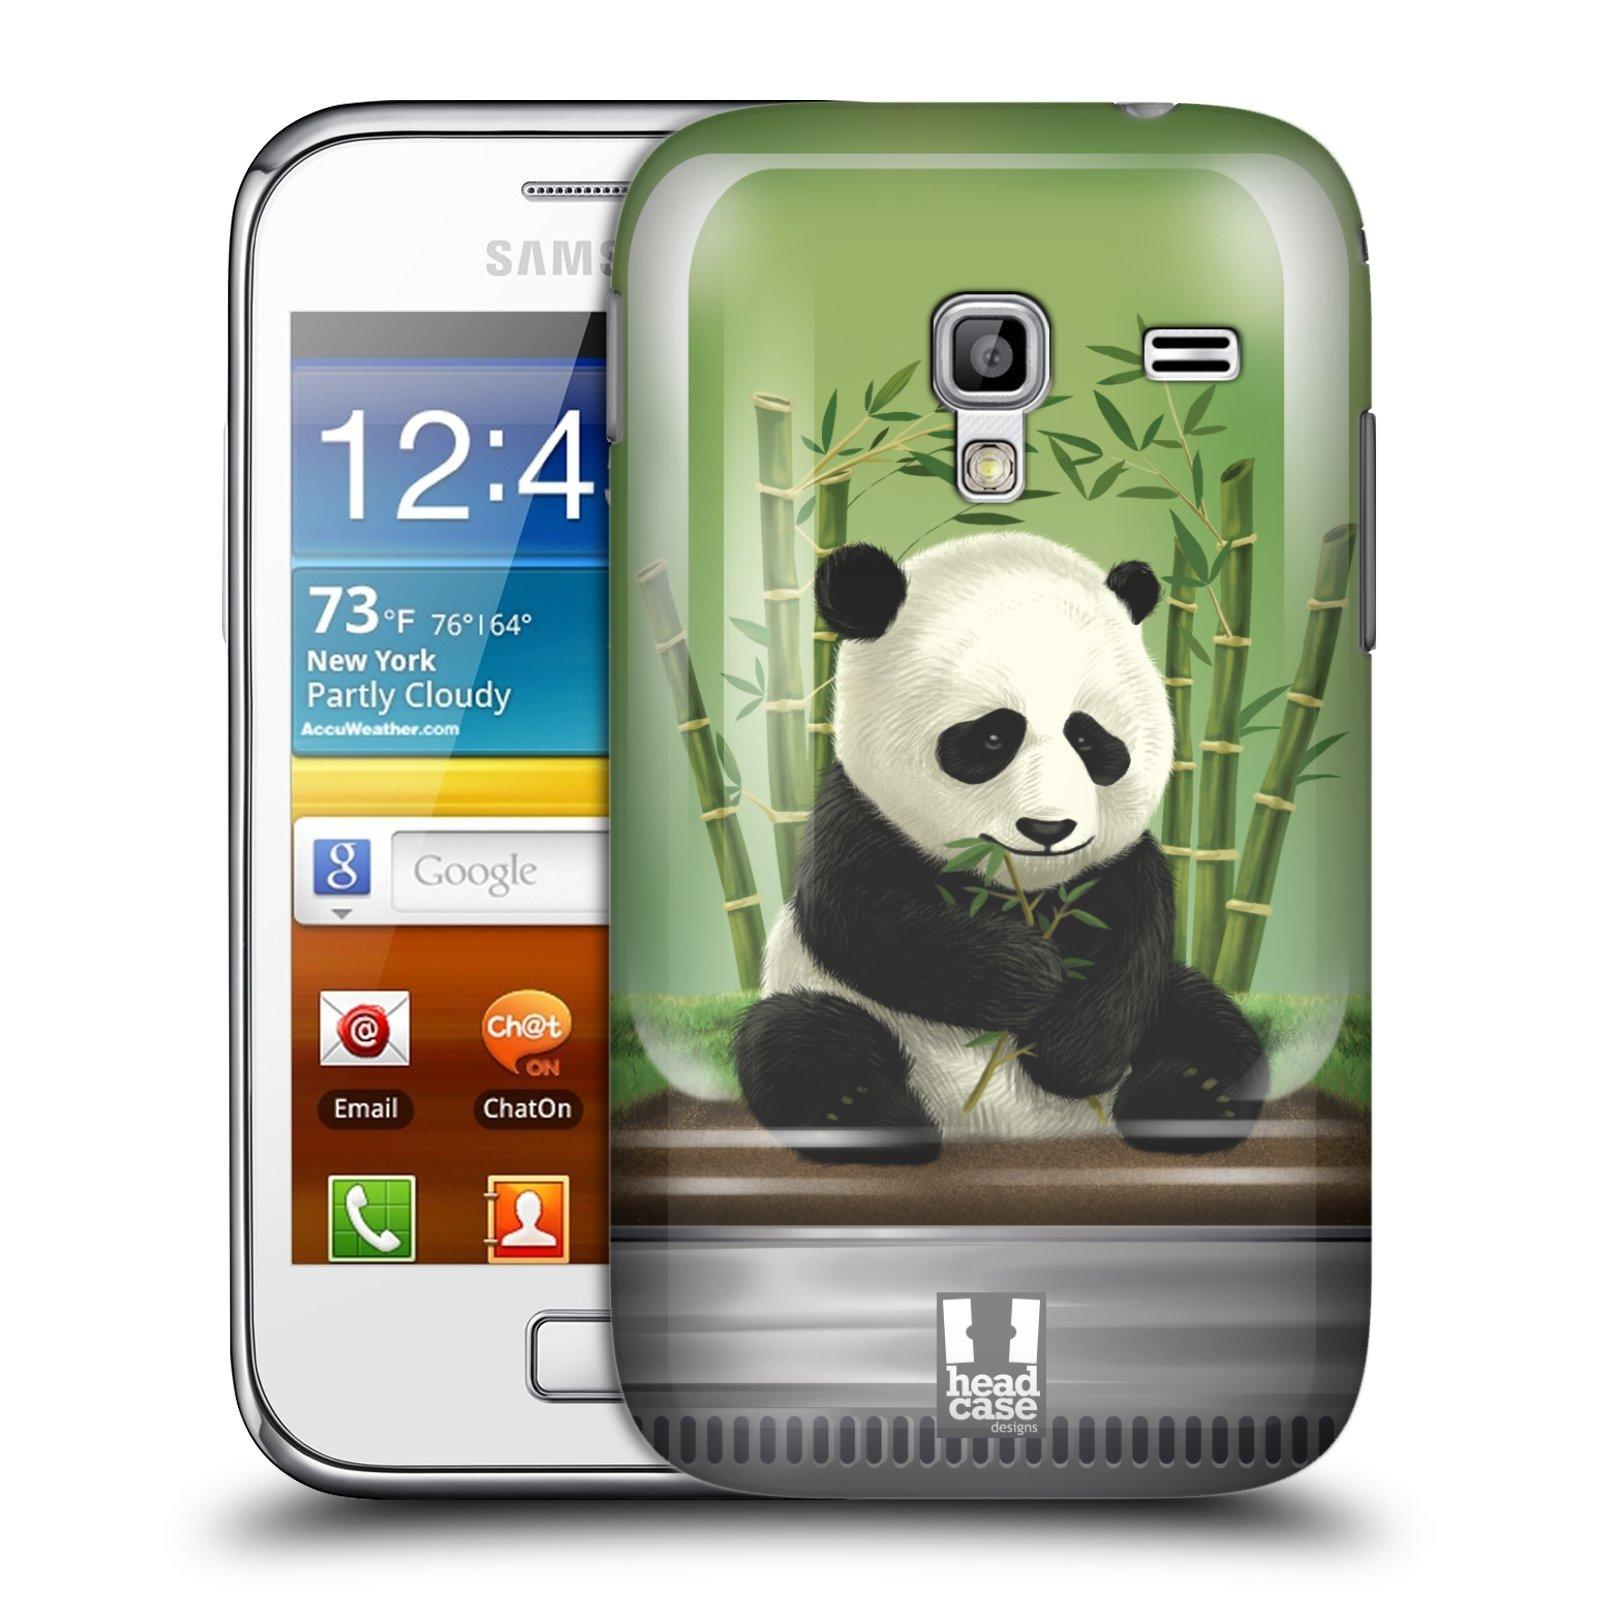 HEAD CASE plastový obal na mobil SAMSUNG GALAXY ACE PLUS (S7500) vzor Zvířátka v těžítku panda